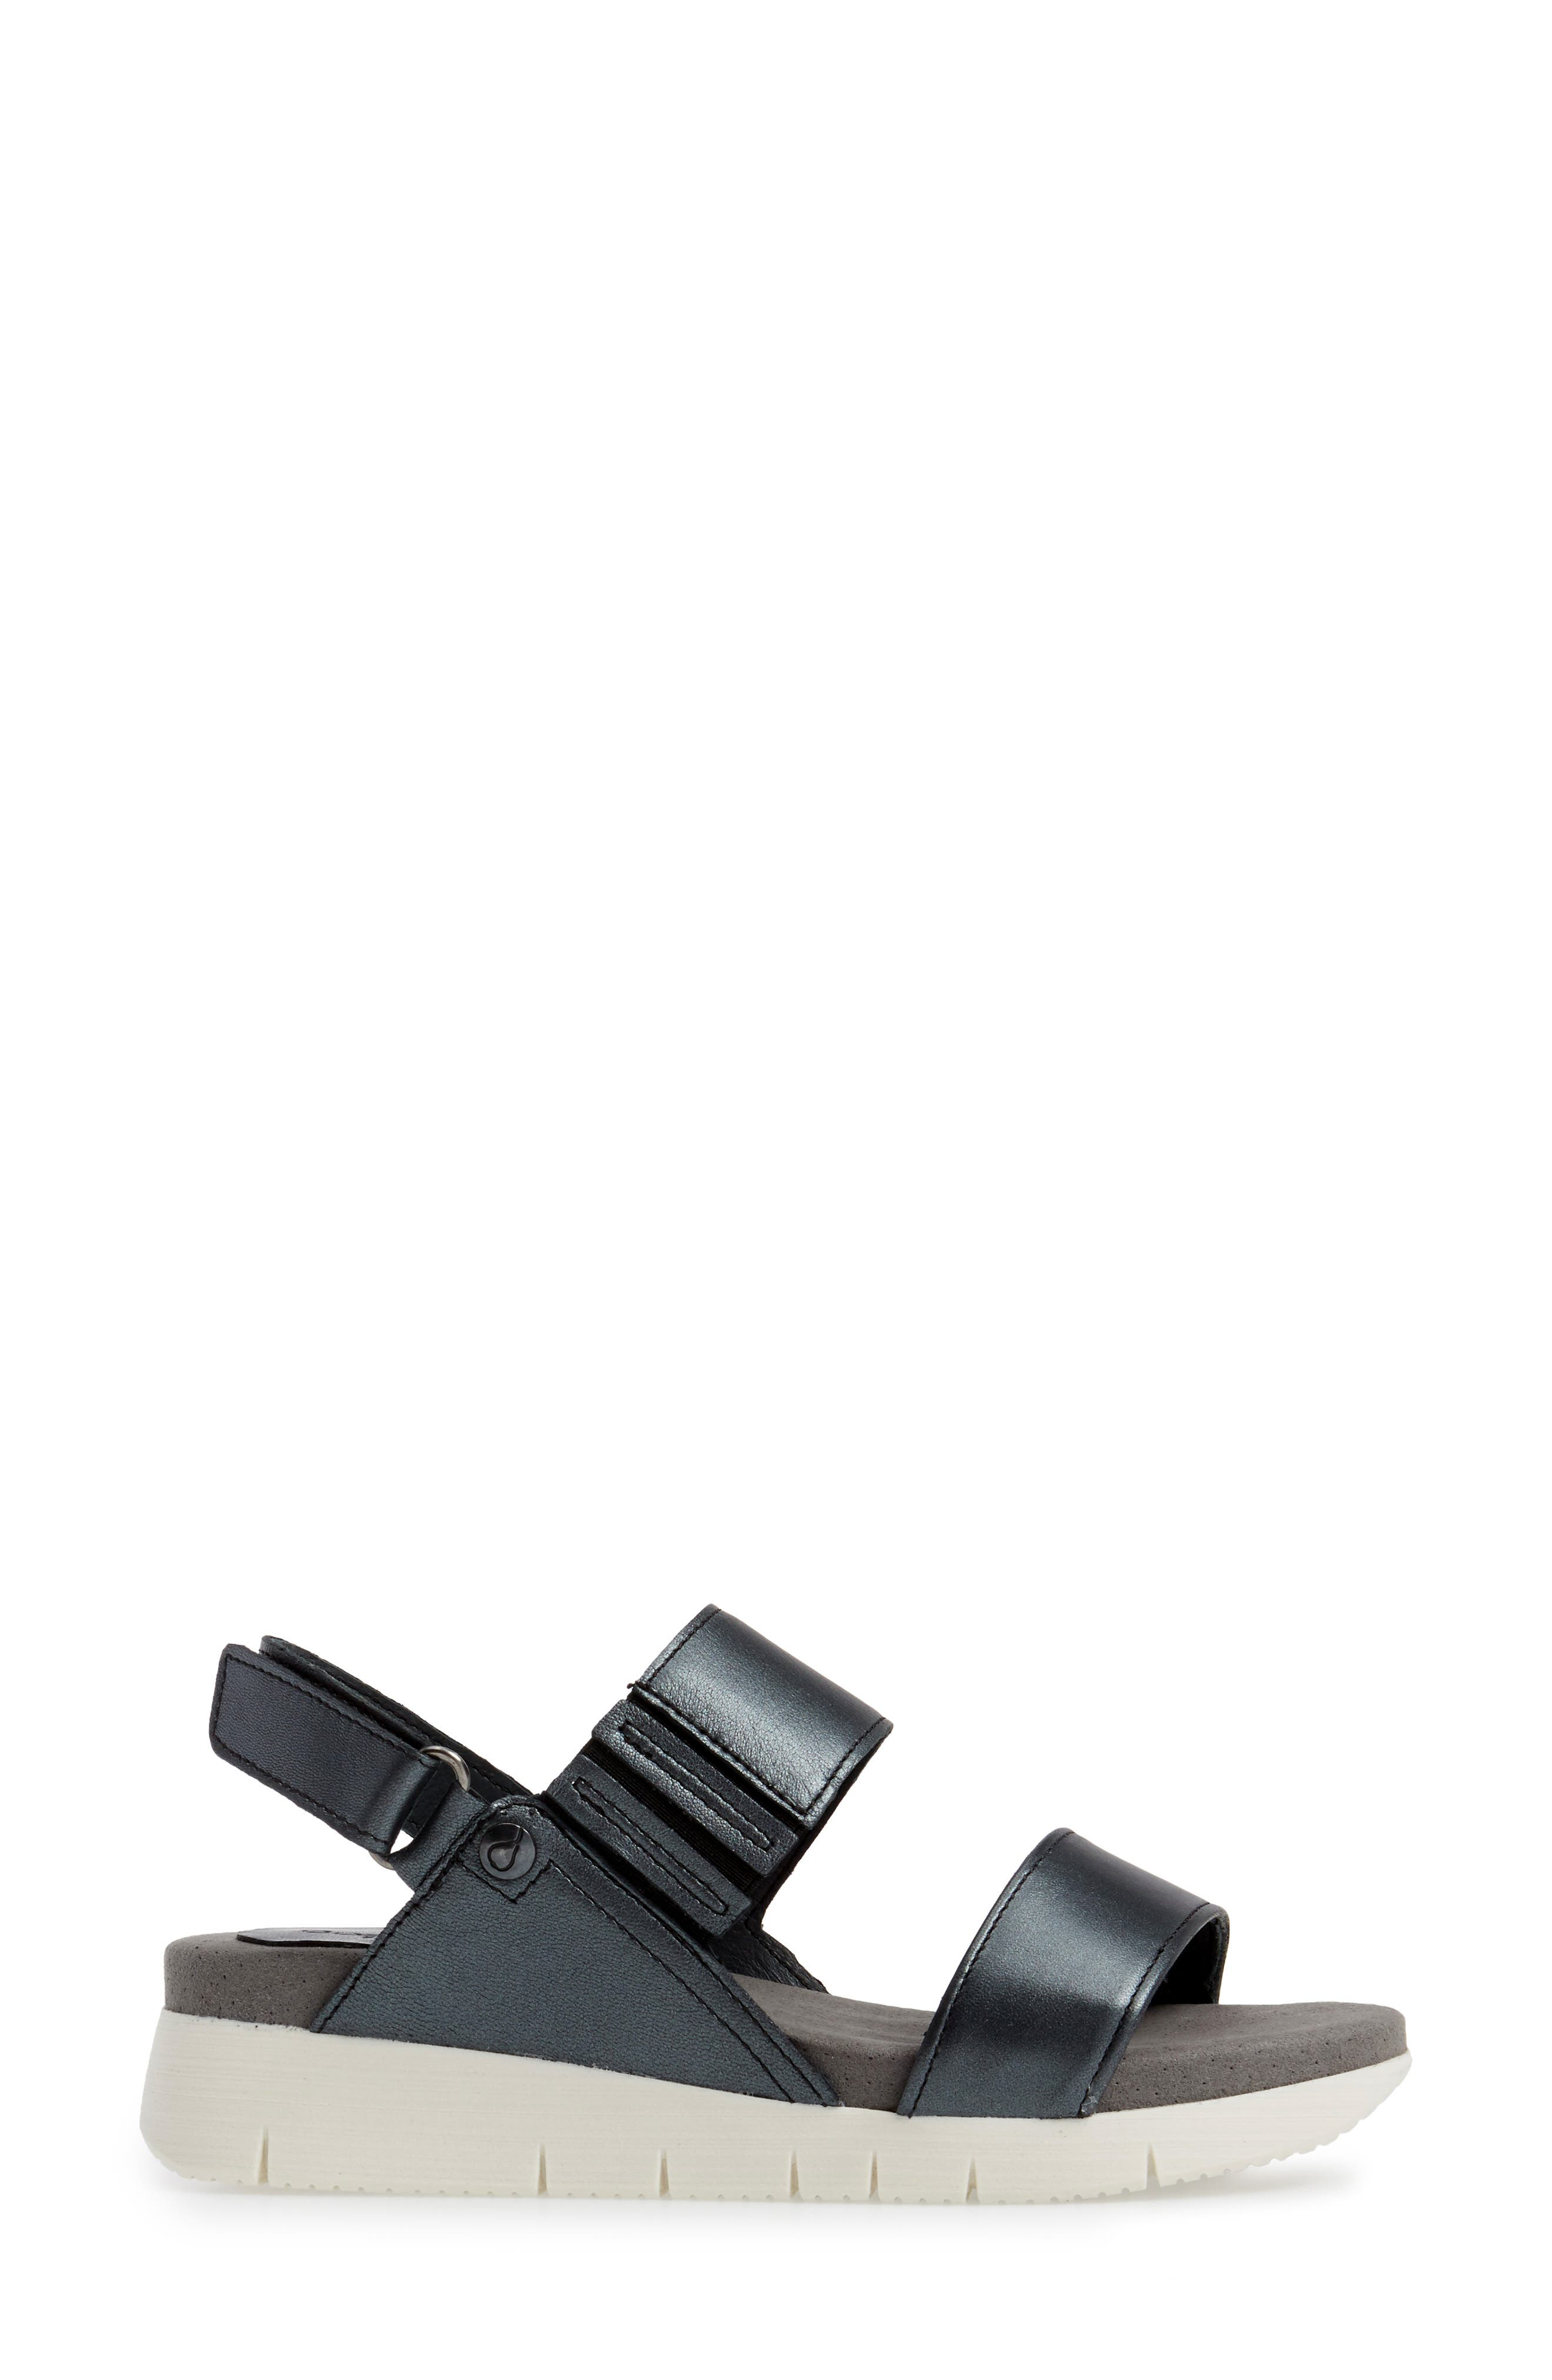 Payge Wedge Sandal,                             Alternate thumbnail 3, color,                             BLACK LEATHER